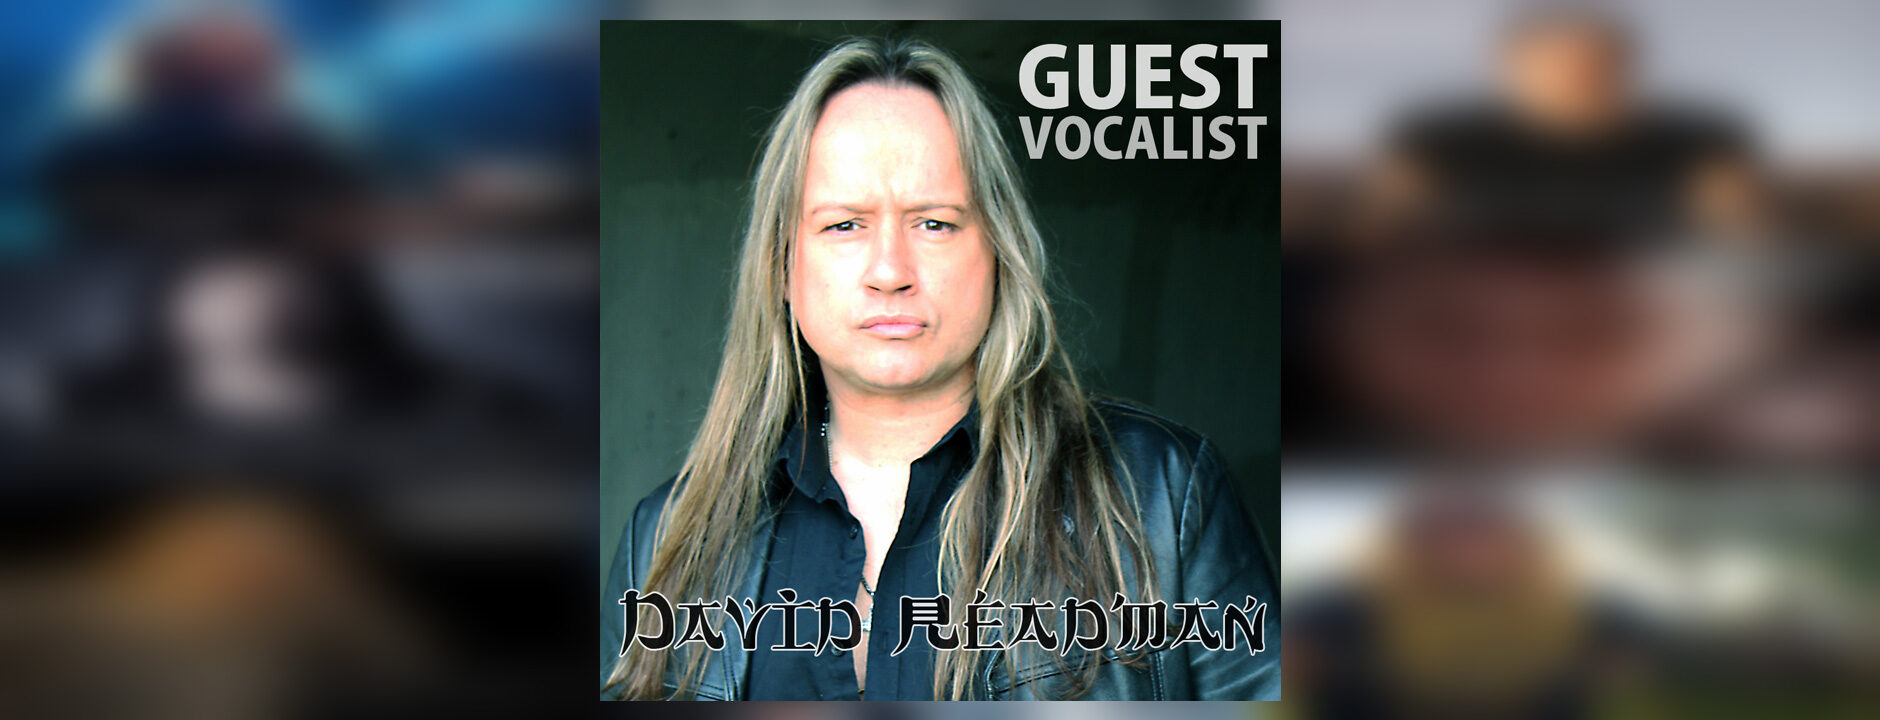 David Readman